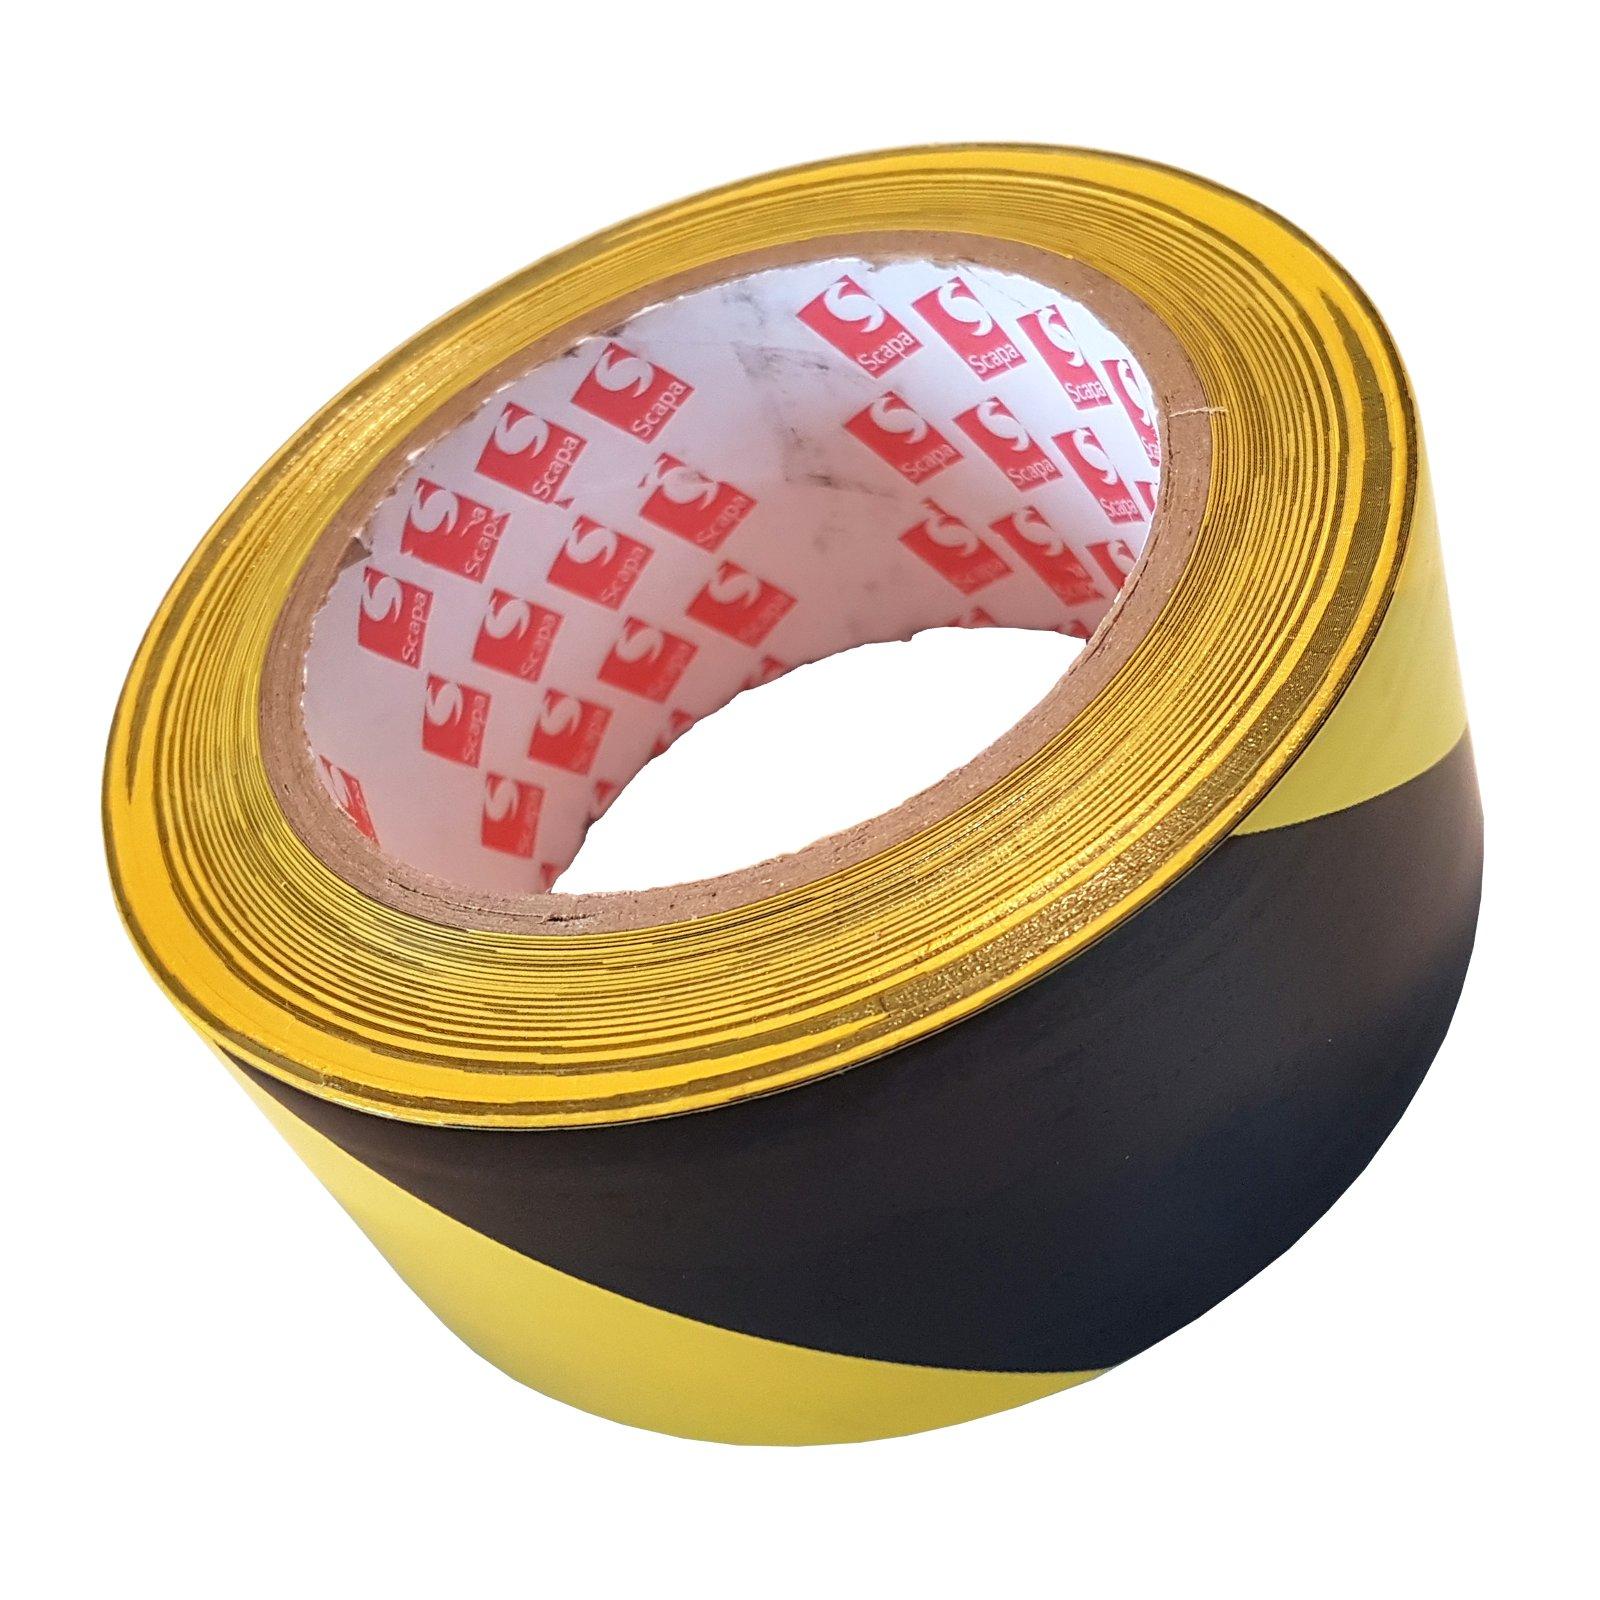 Лента защитная маркировочная Scapa 2724 50мм / 33м желто-черная